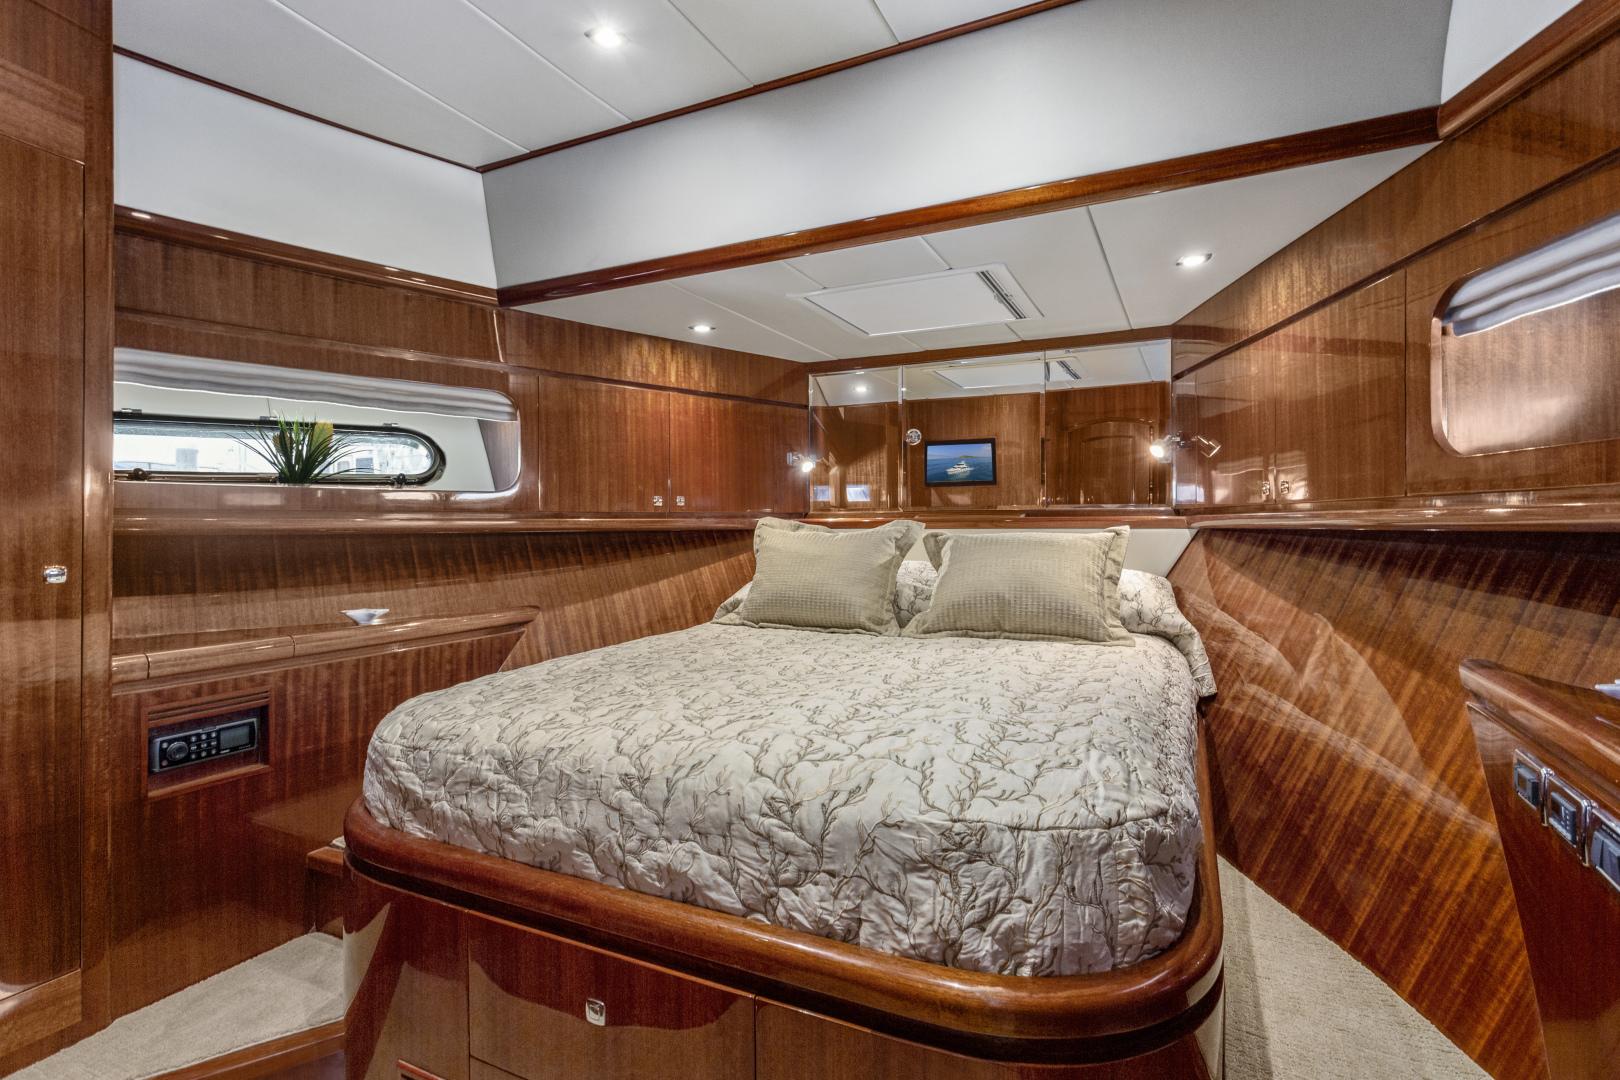 Hampton-76 Skylounge Motoryacht 2014-ODYSEA San Diego-California-United States-VIP STATEROOM-1165167 | Thumbnail